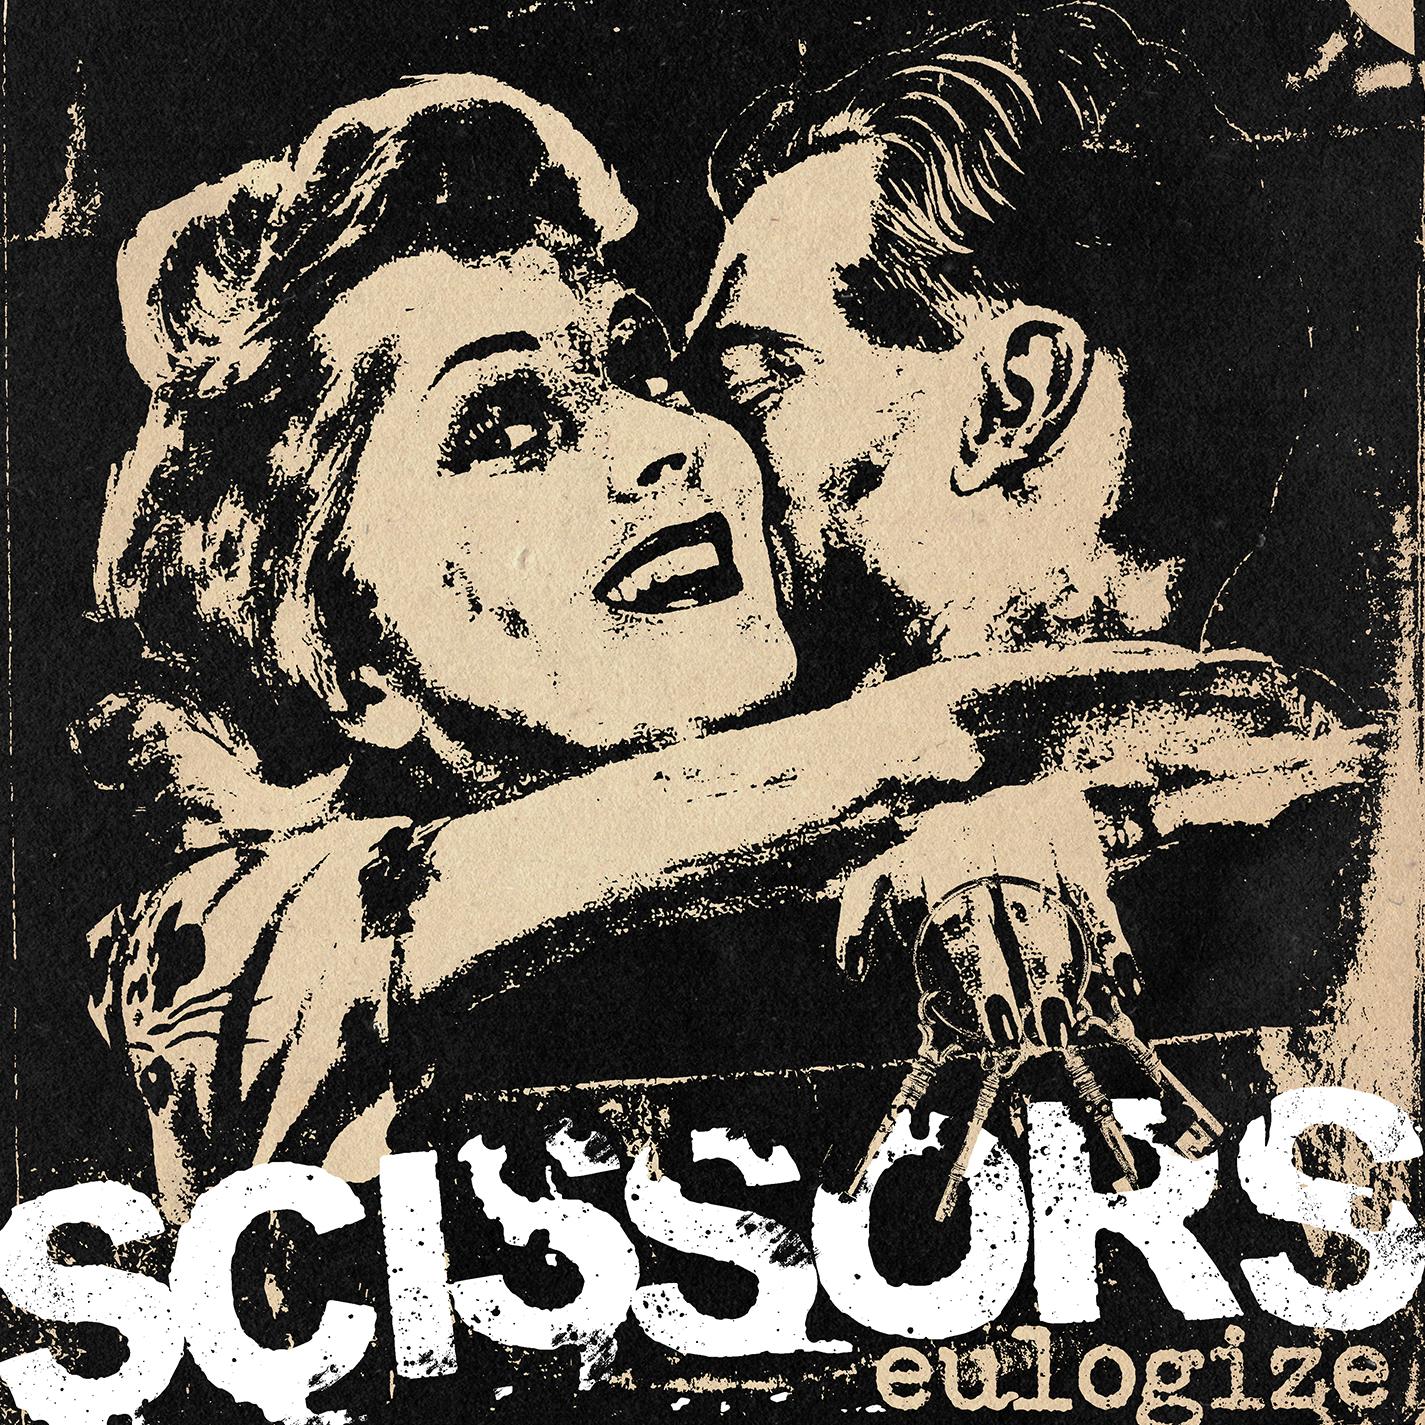 Scissors_Eulogize.jpg